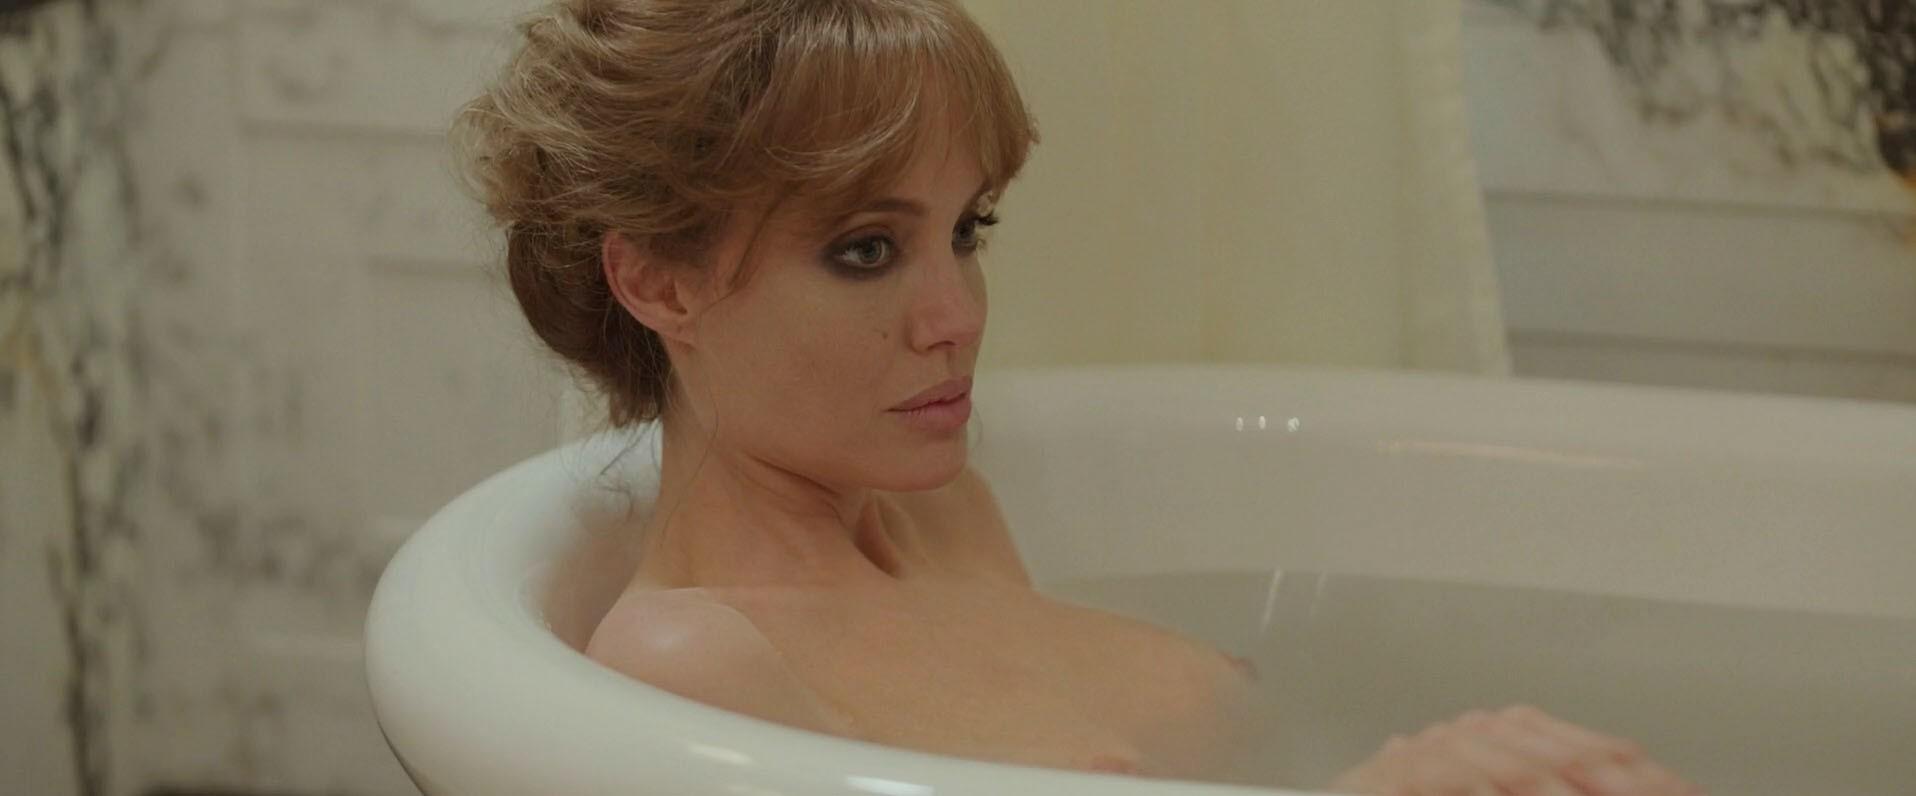 Angelina Jolie Mojave Moon Nude angelina jolie nude, naked - pics and videos - imperiodefamosas